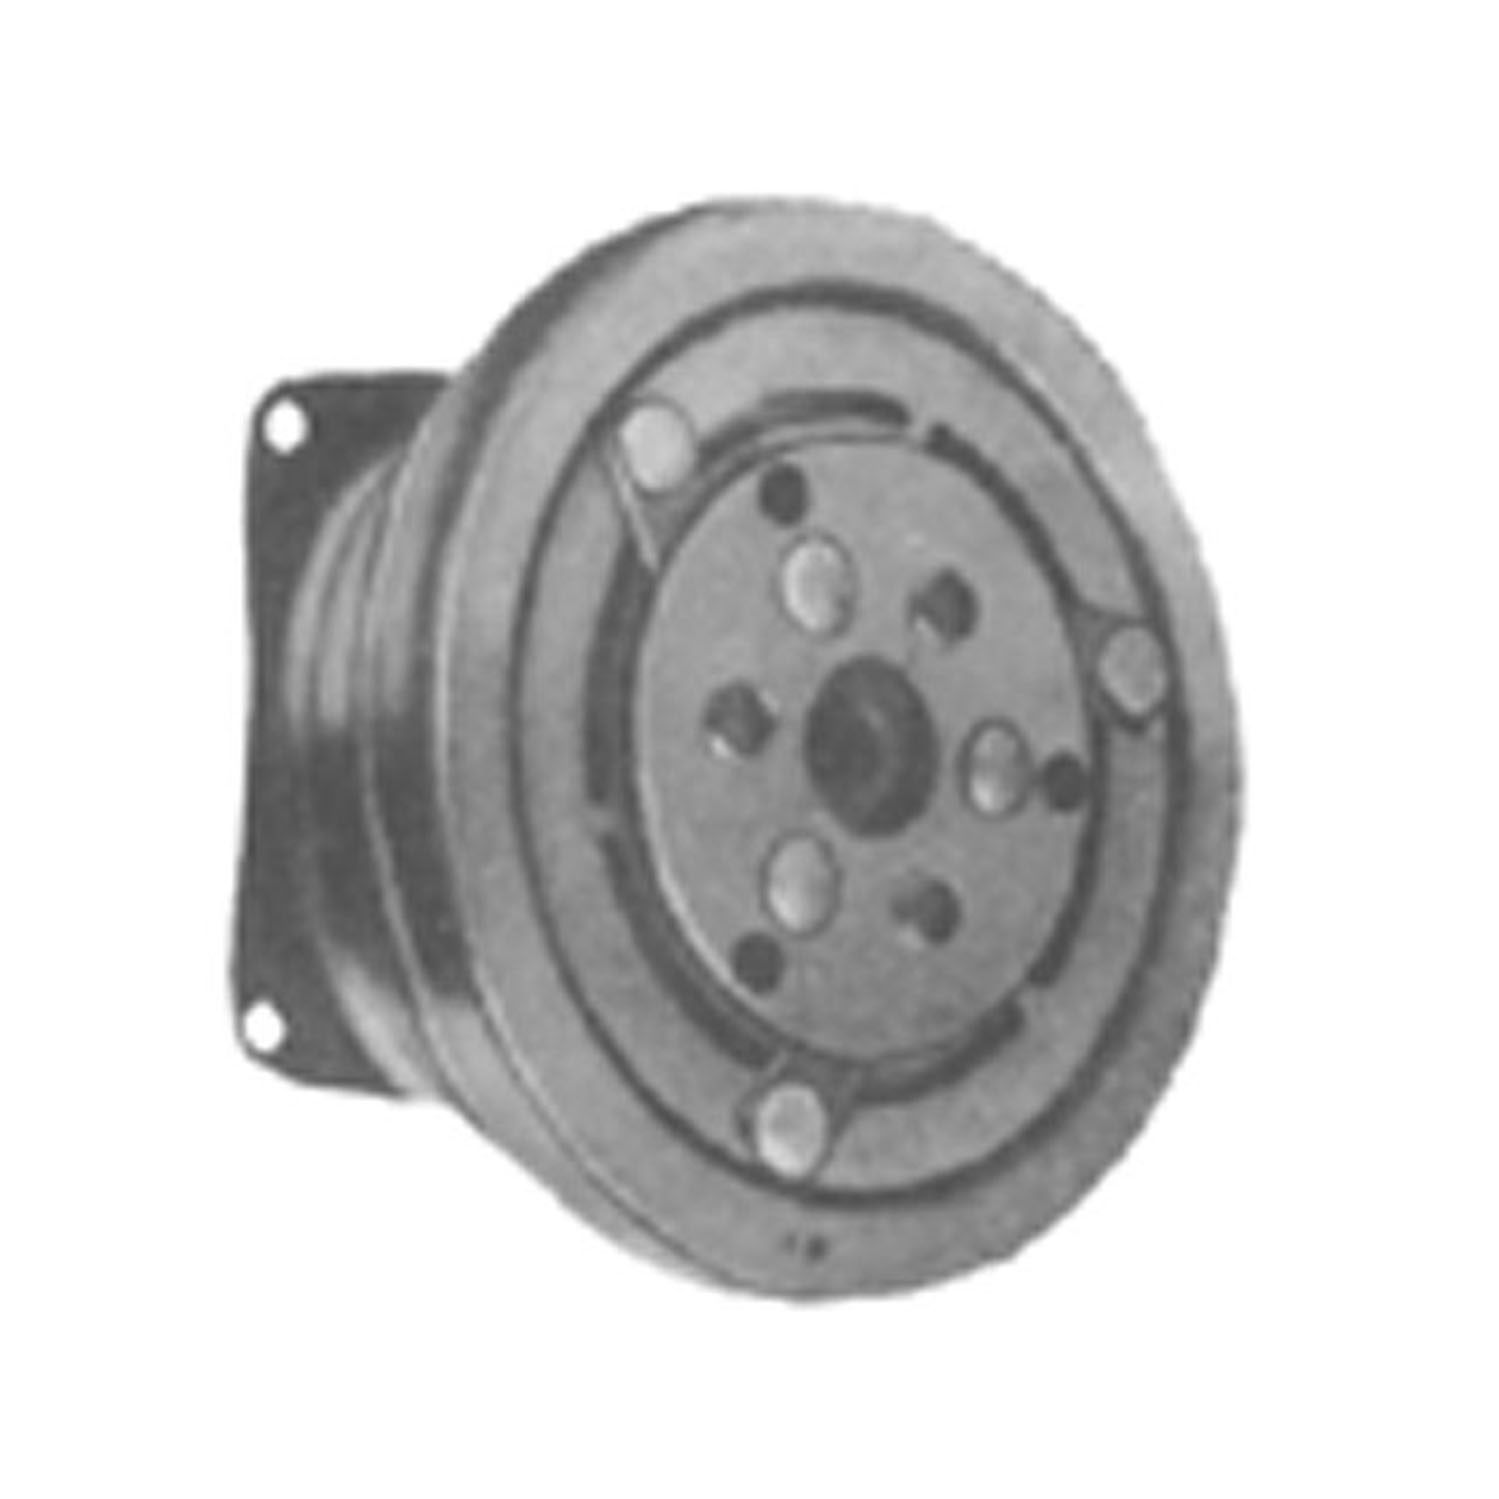 Compressor Clutch YORK 6.25 1G